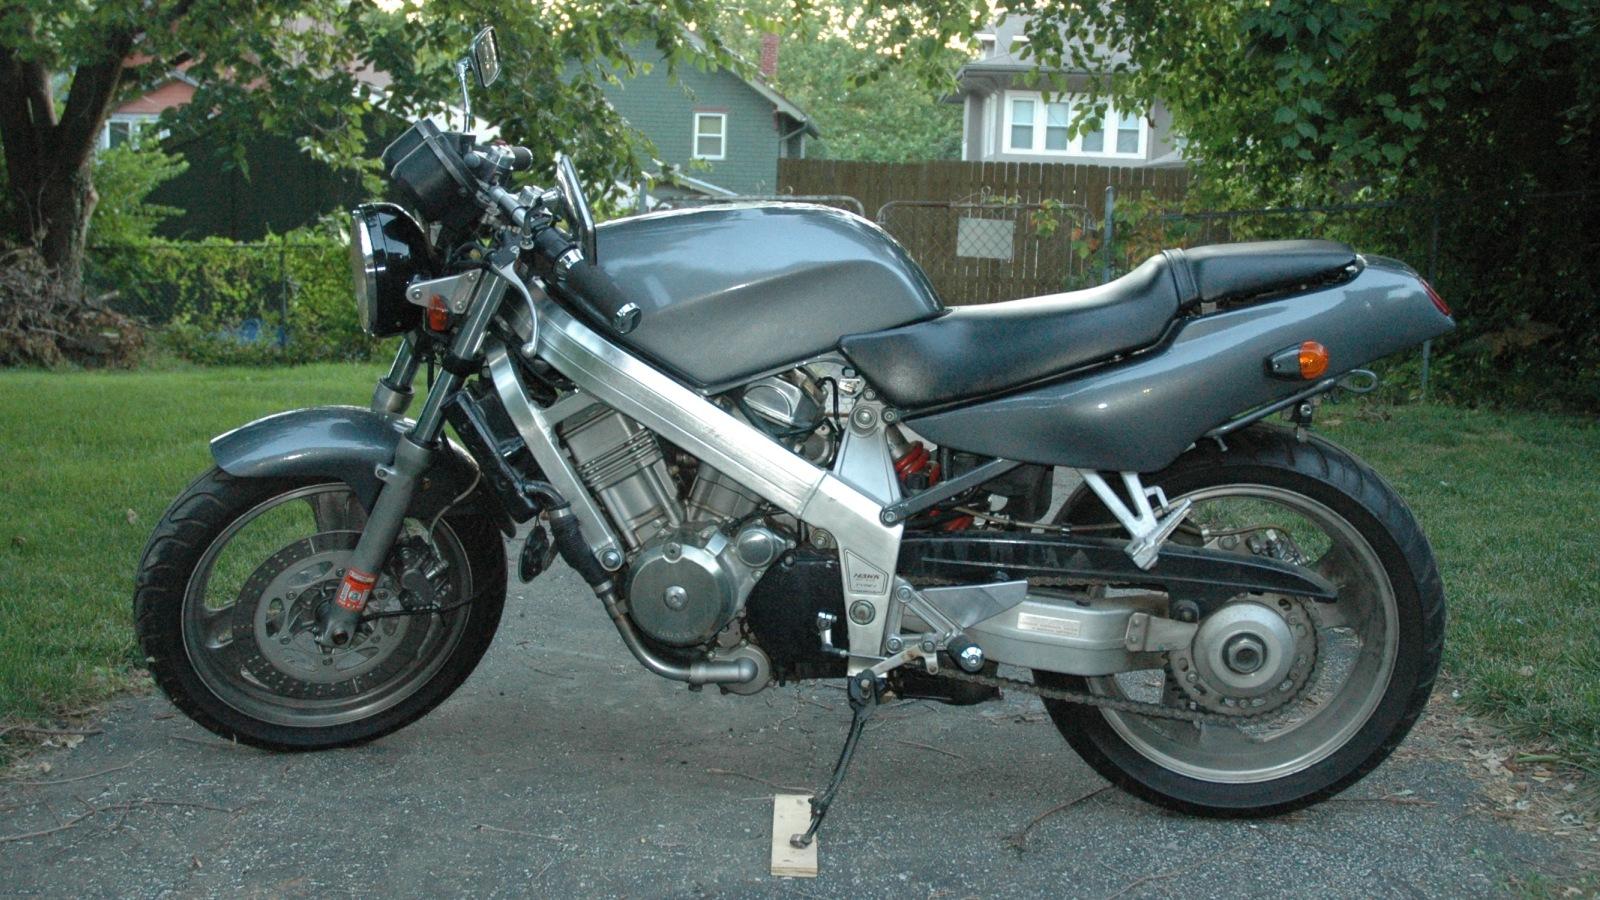 Craigslist kc motorcycle parts | Сars & Motorcycles